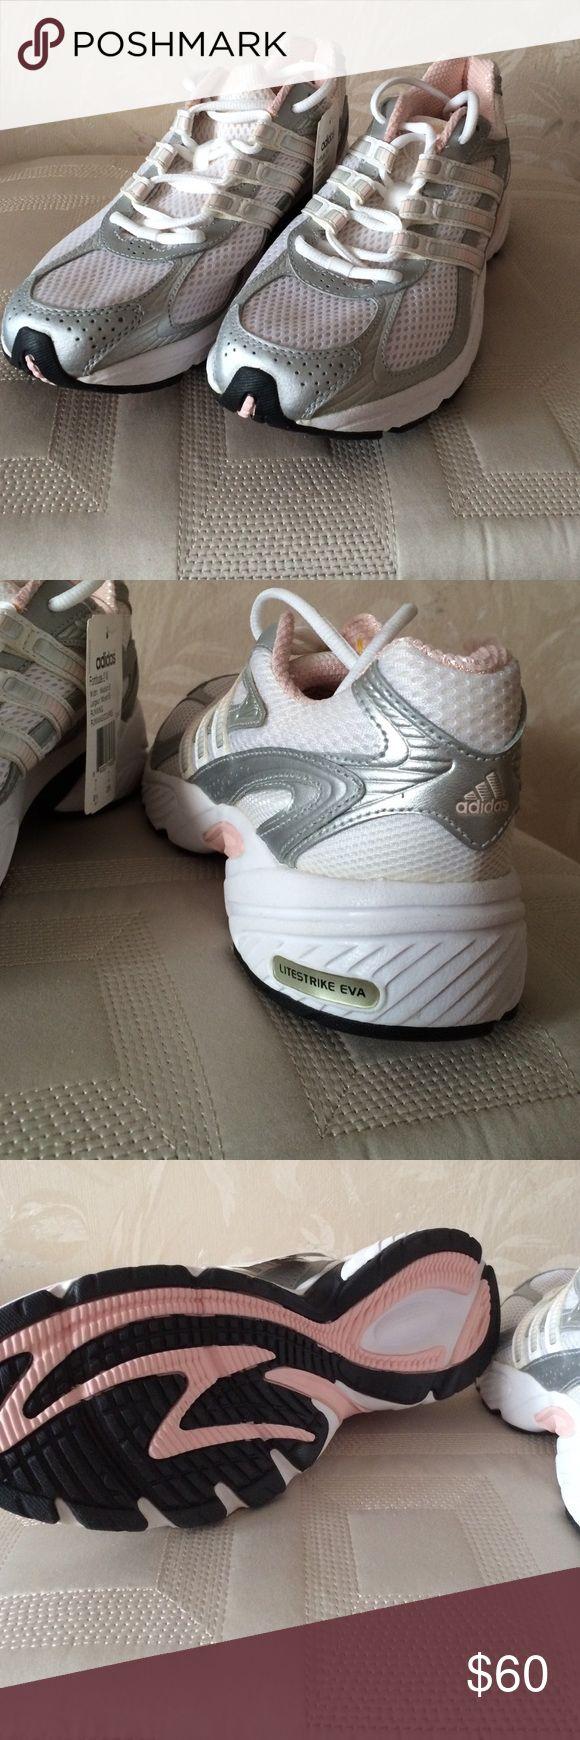 Adidas running shoes size 8.5 -medium B New Adidas running shoes size 8.5 -medium B adidas Shoes Sneakers